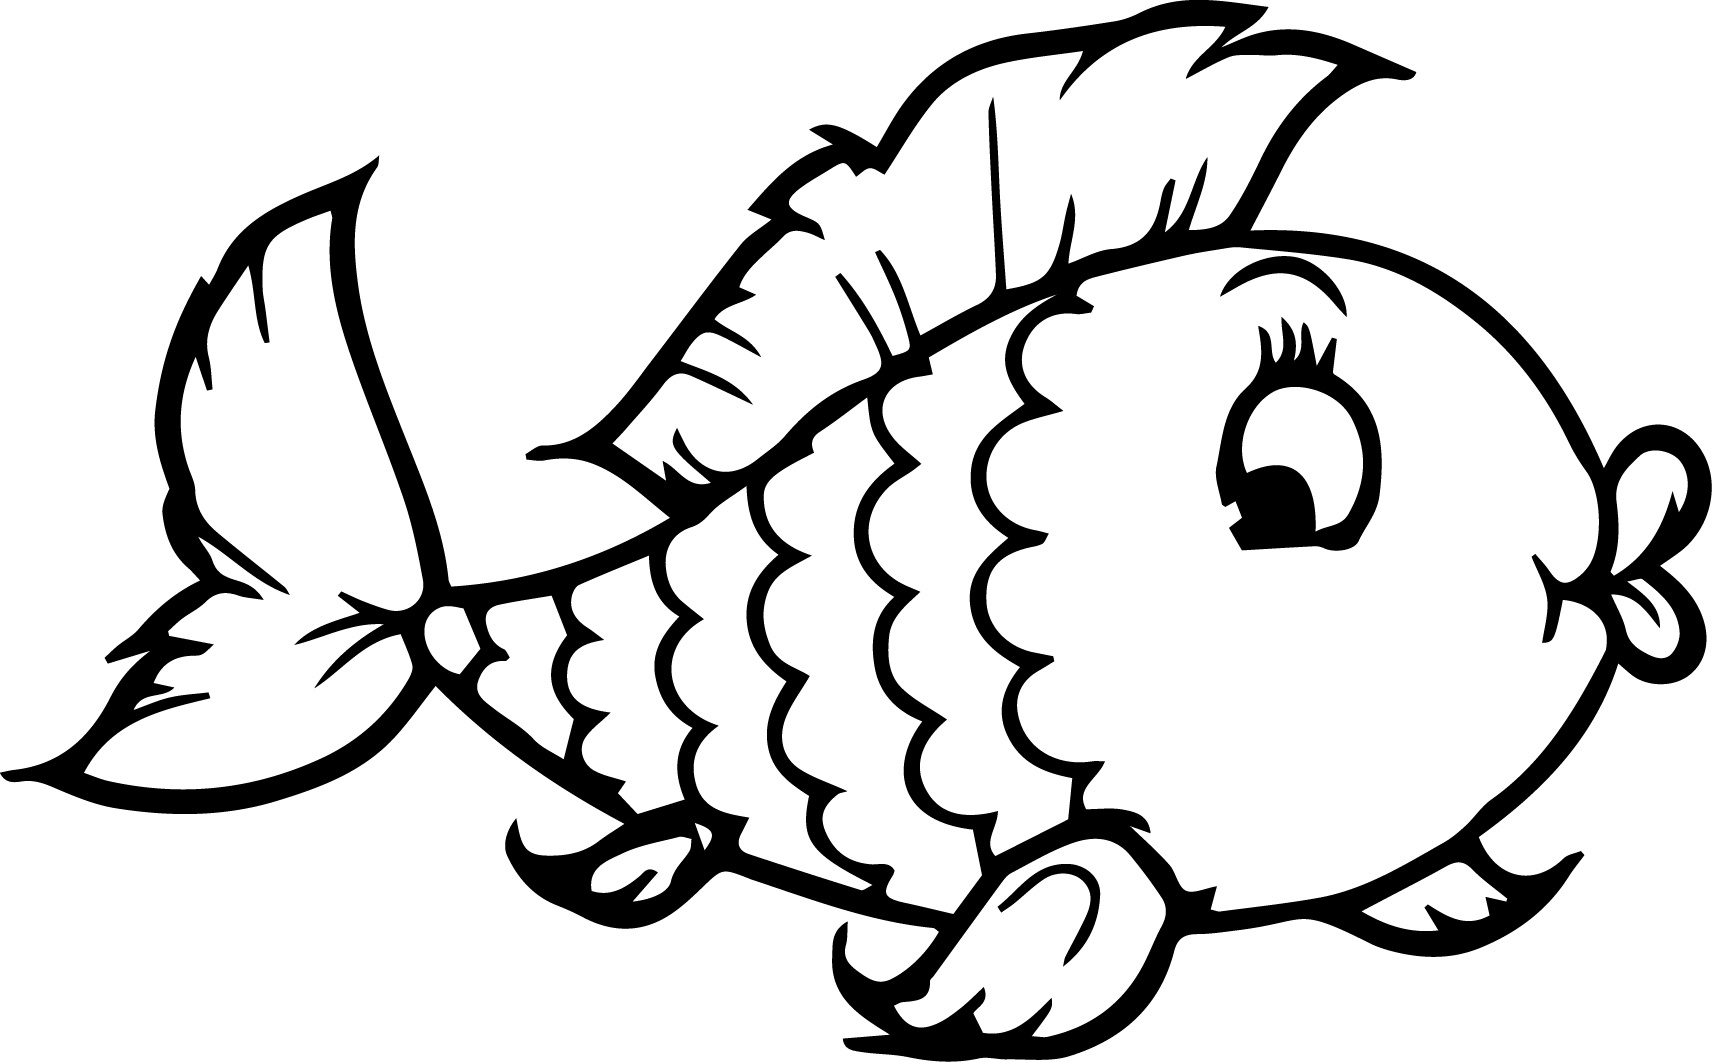 1712x1062 Shrewd Coloring Sheets Of Fish Page